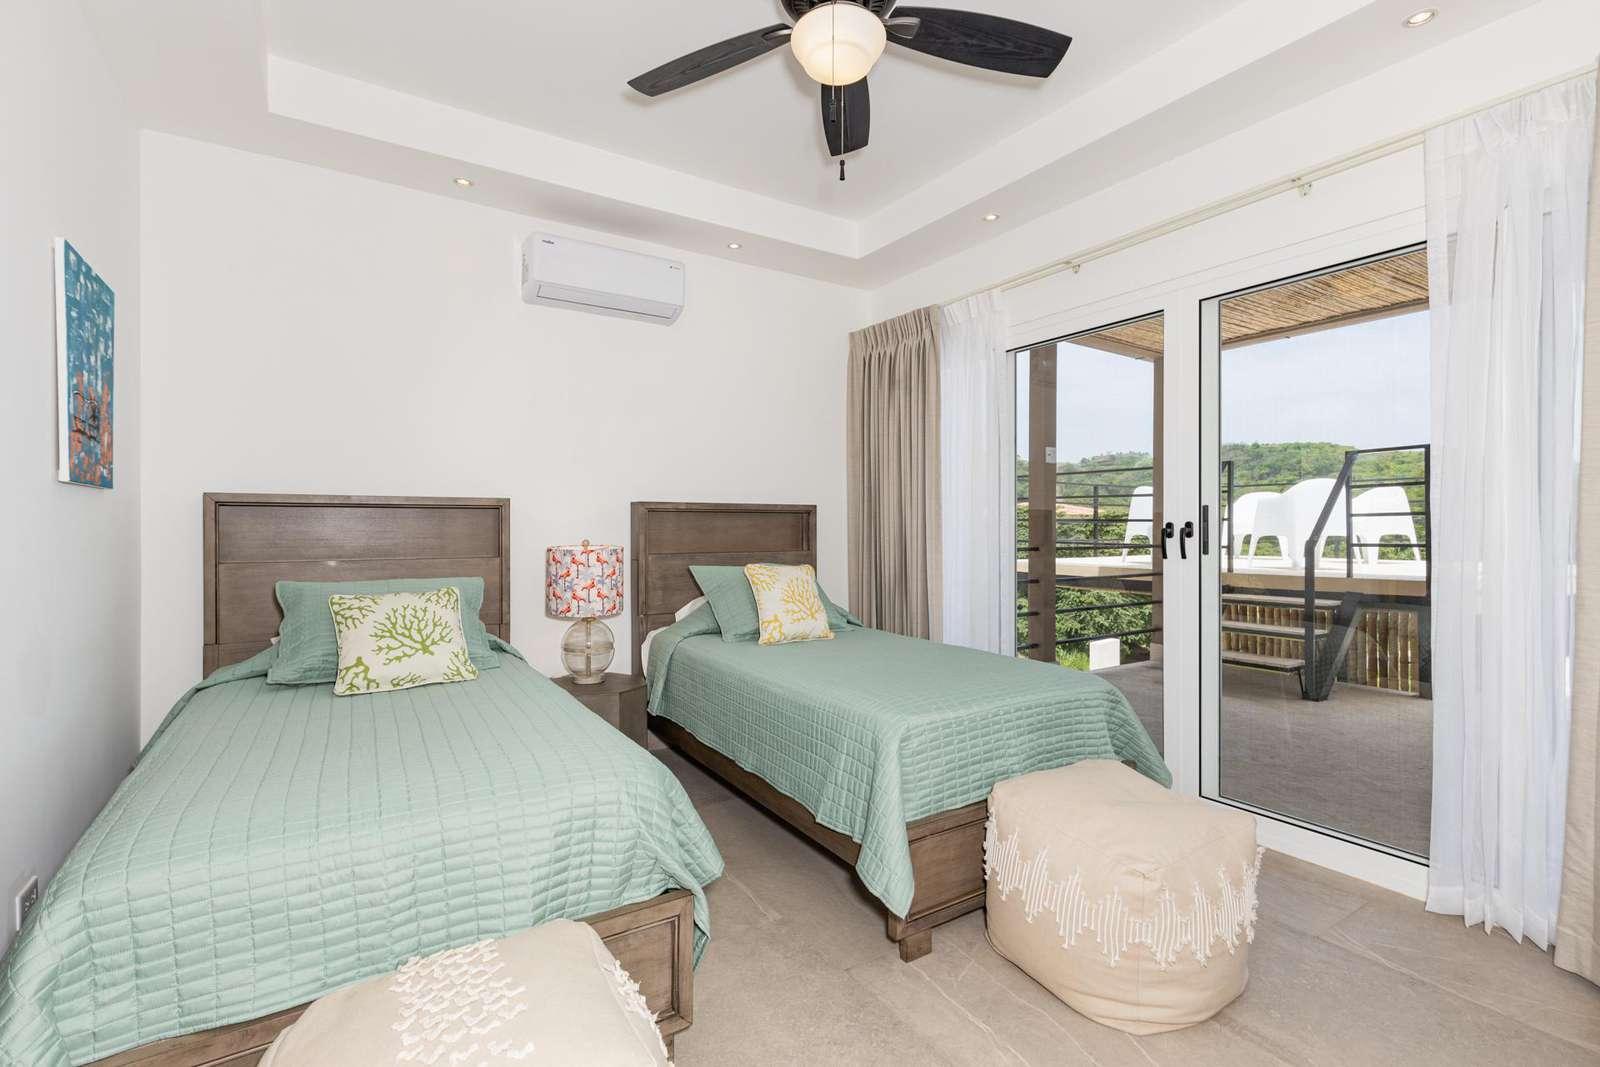 Guest bedroom, 2 twin beds, walk in closet, private bathroom